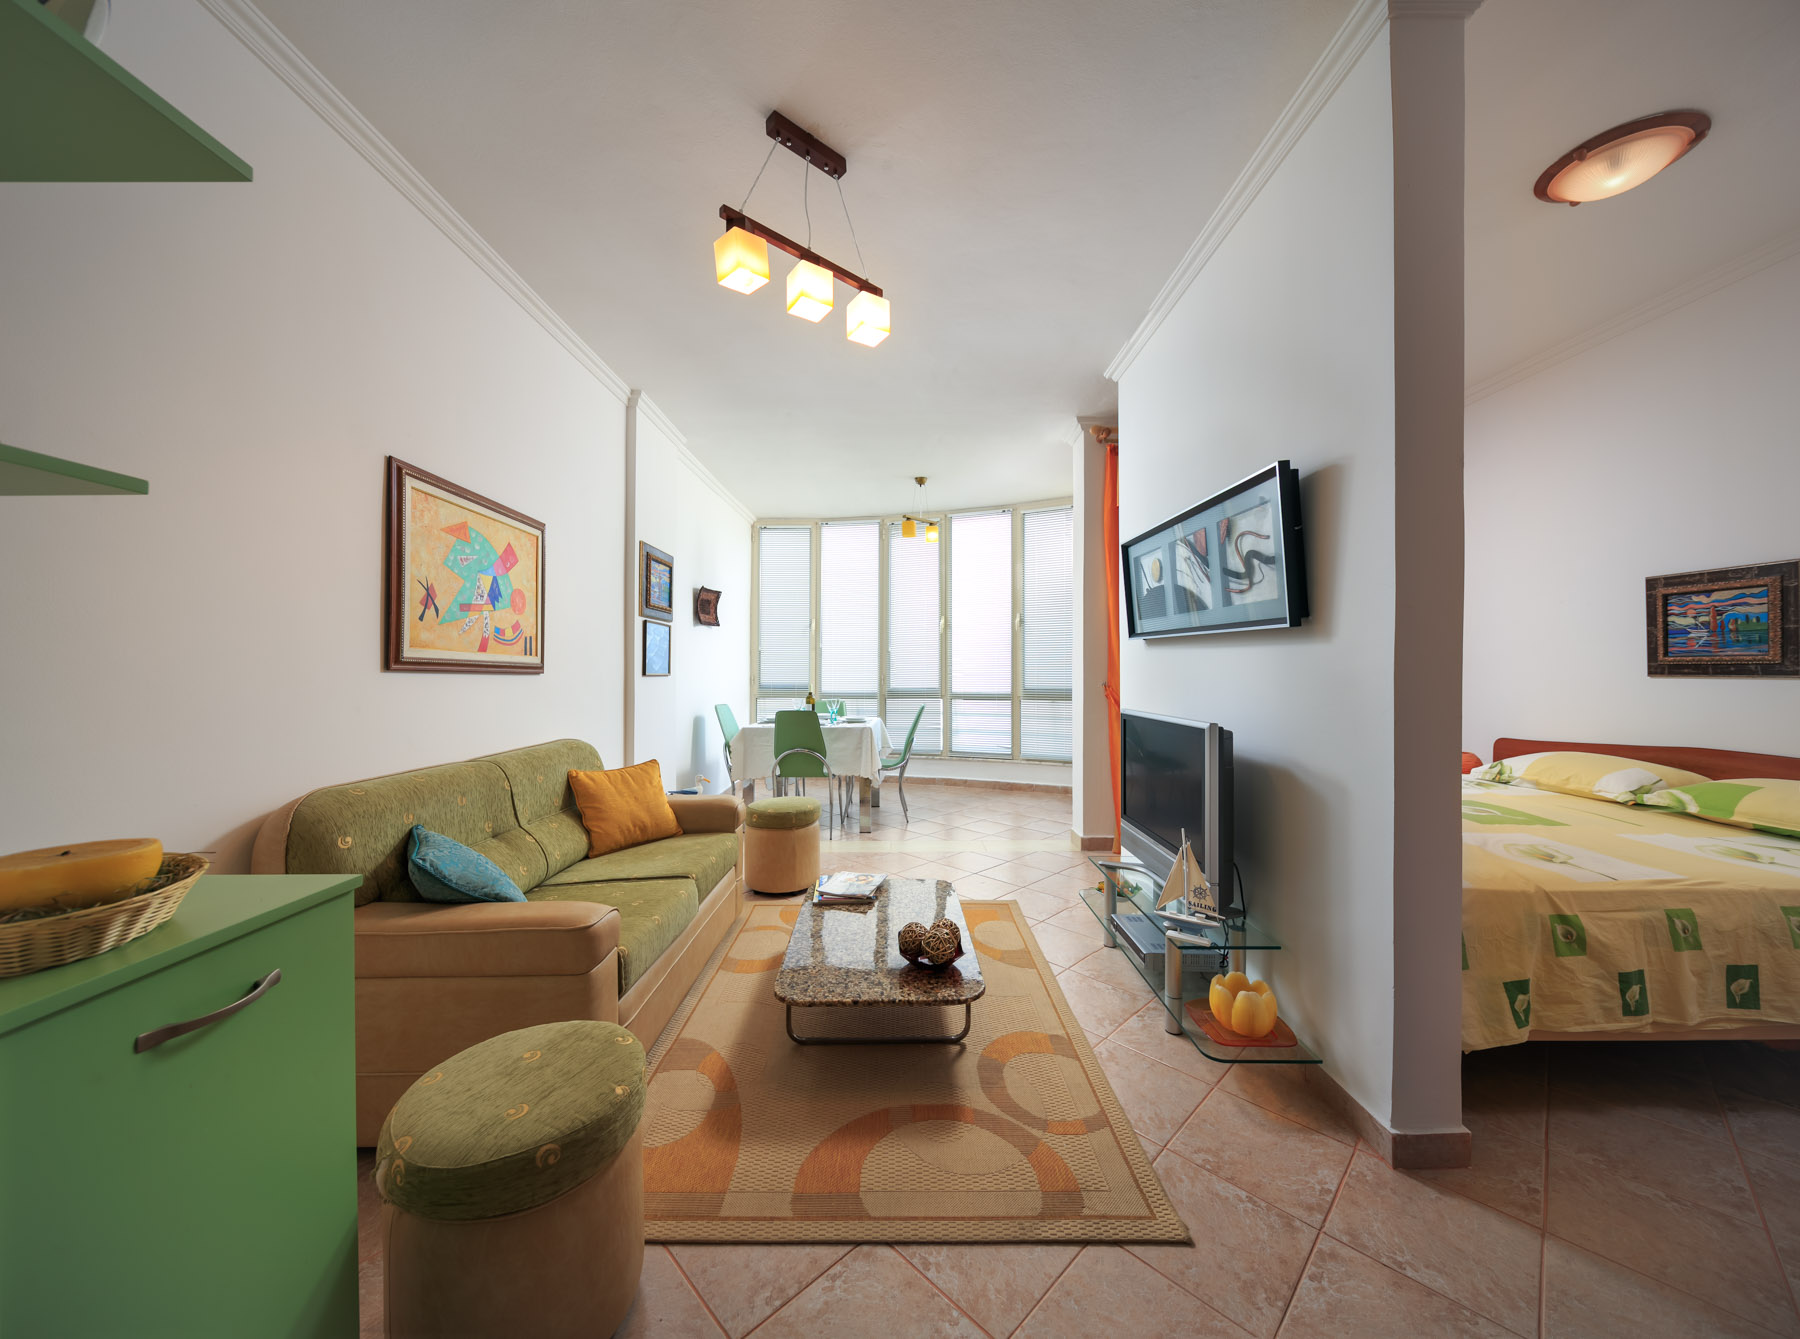 Apartament ne shitje, Okazion Ideal per Pushim,Perfshihet ne cmim arredim mobilim modern ,garazhdi si dhe disponohet dokumentacion i rregull, Cmimi 26700 € (Okazion)